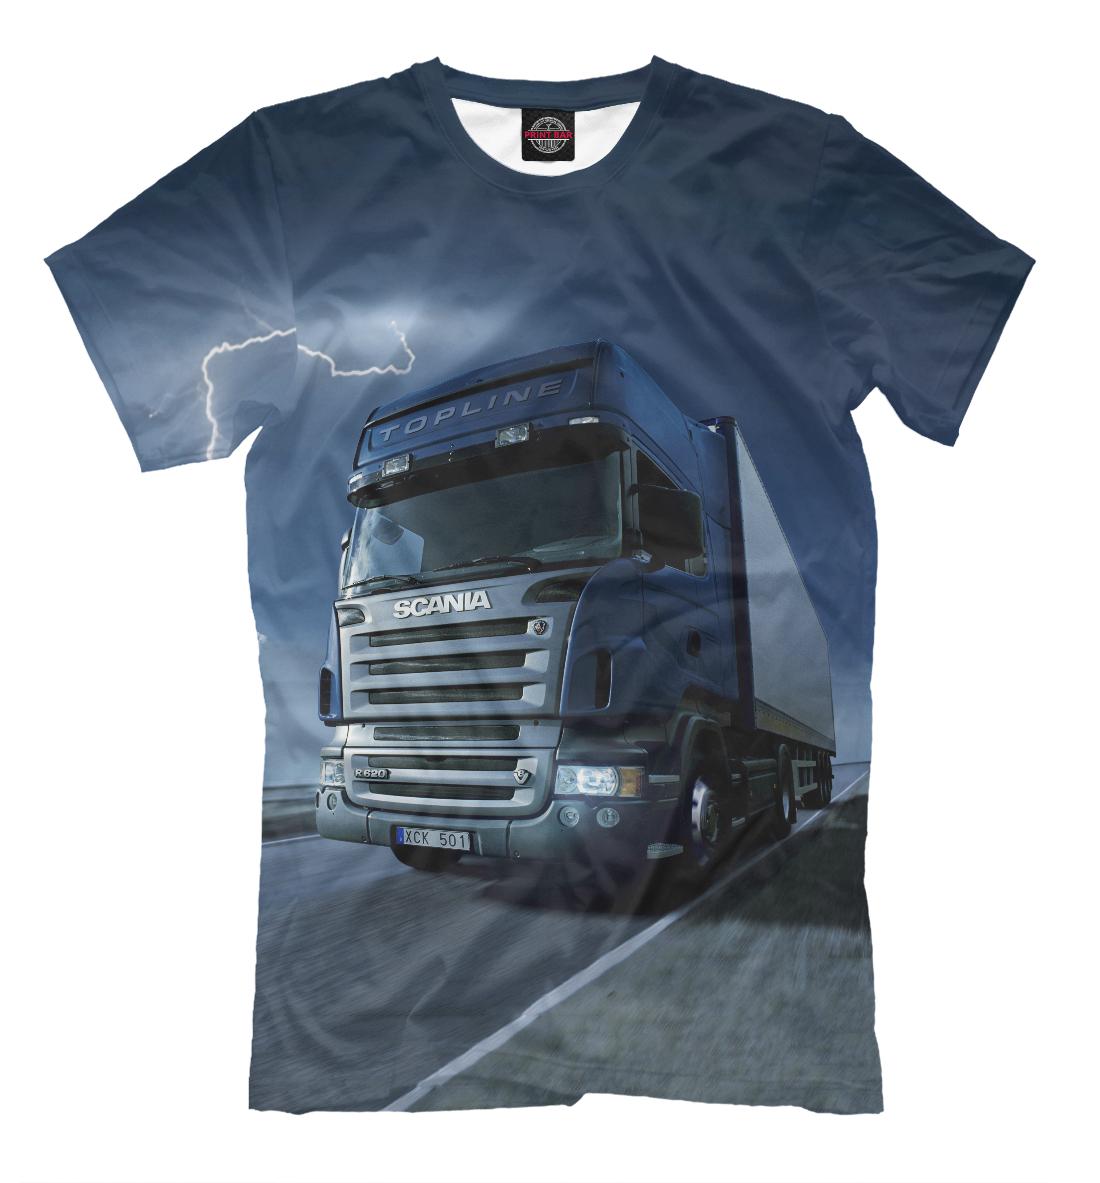 Купить Scania, Printbar, Футболки, GRZ-690904-fut-2